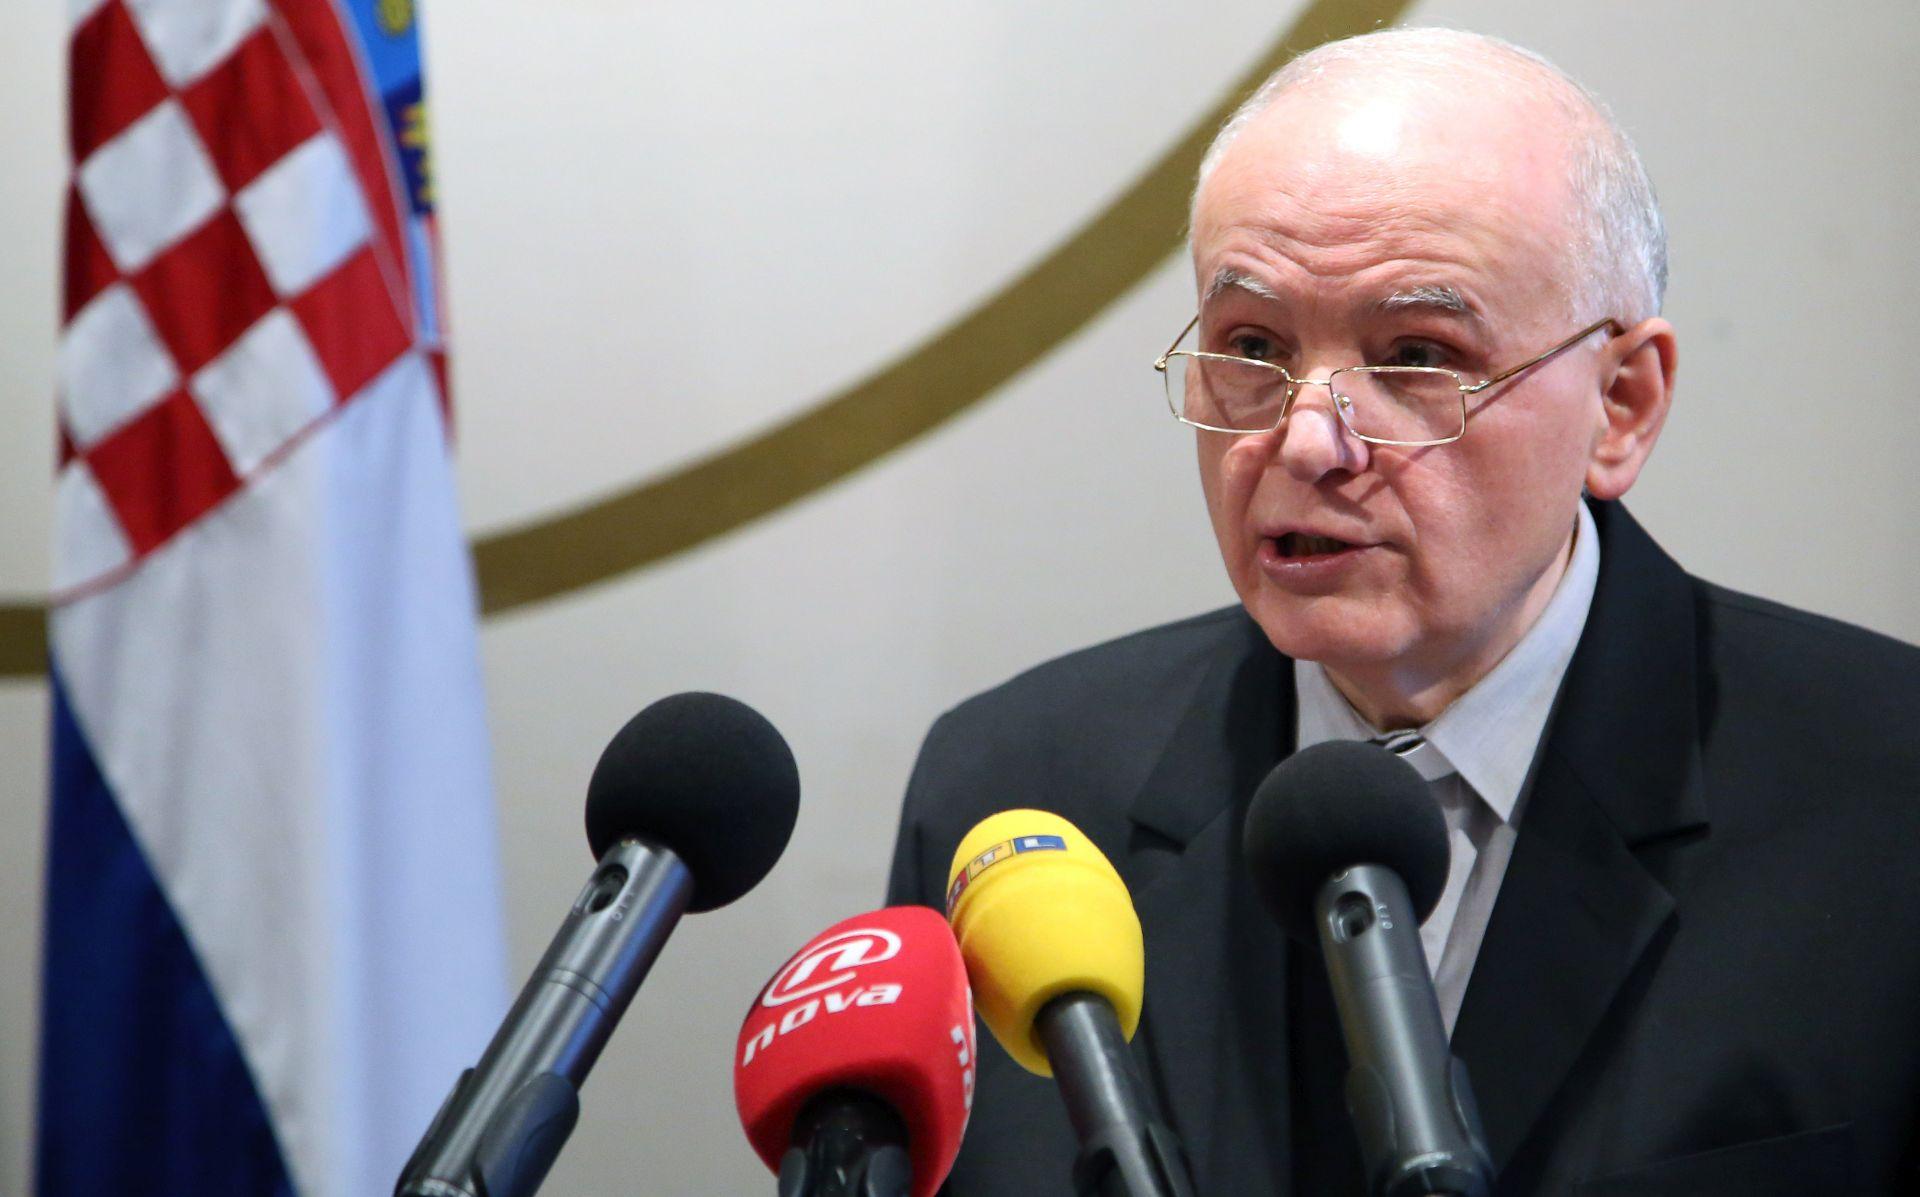 ALESSANDRO D'ERRICO Vatikan zadovoljan suradnjom s Hrvatskom